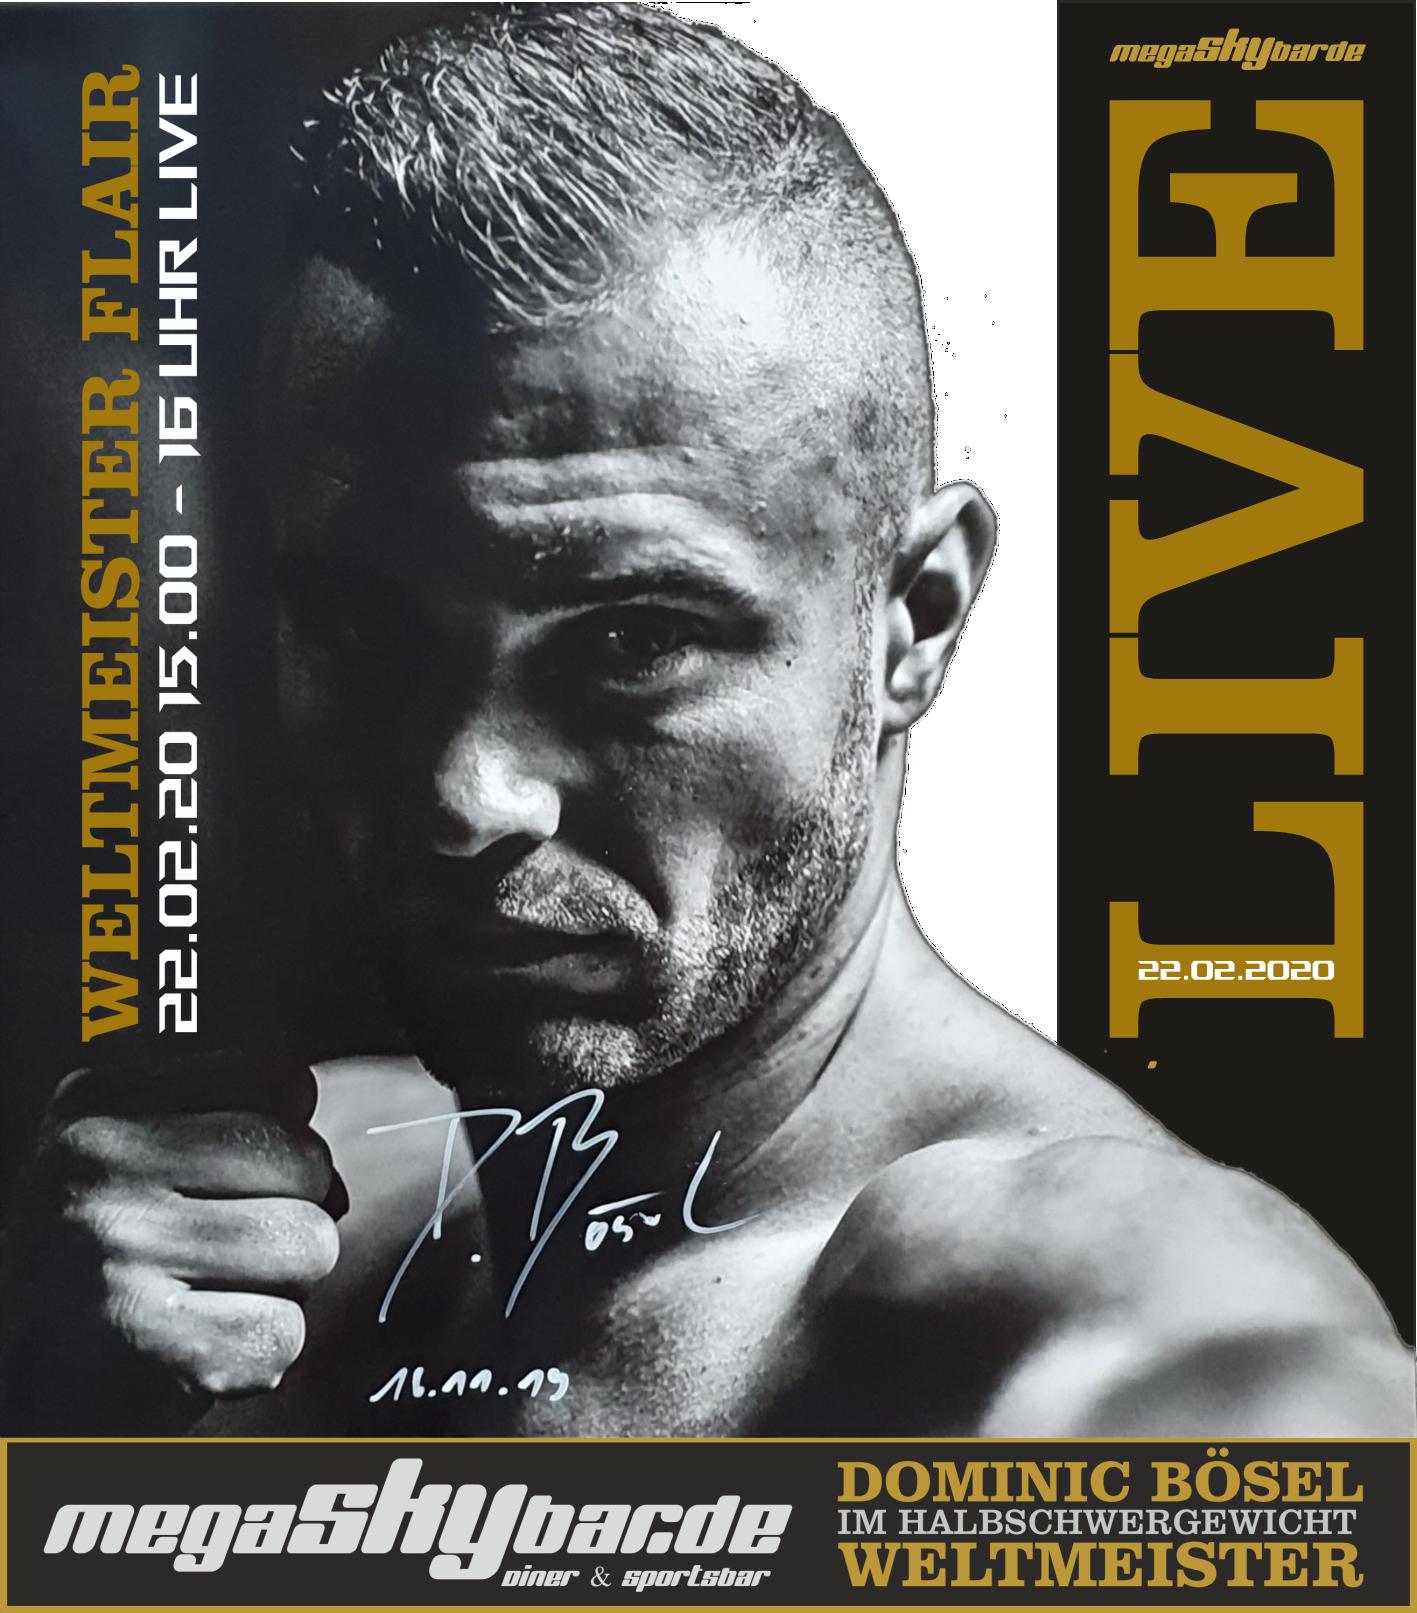 Dominiclive2.0